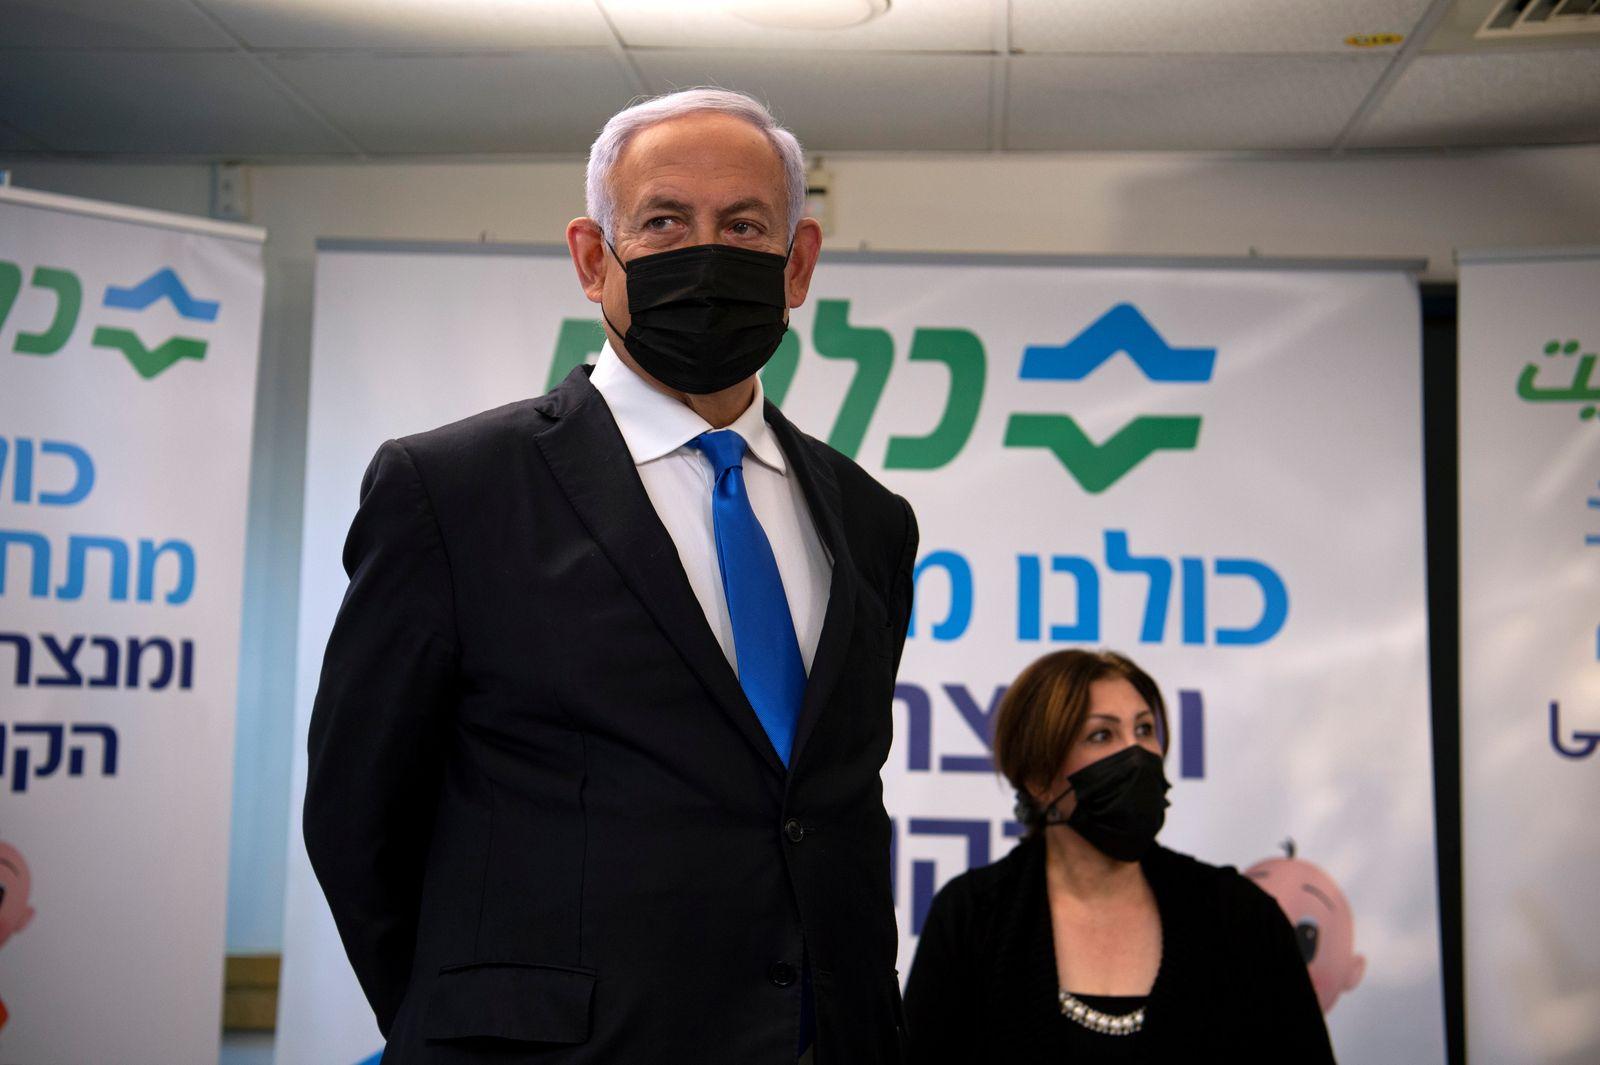 Israeli PM Netanyahu visits a coronavirus vaccination facility in Nazareth